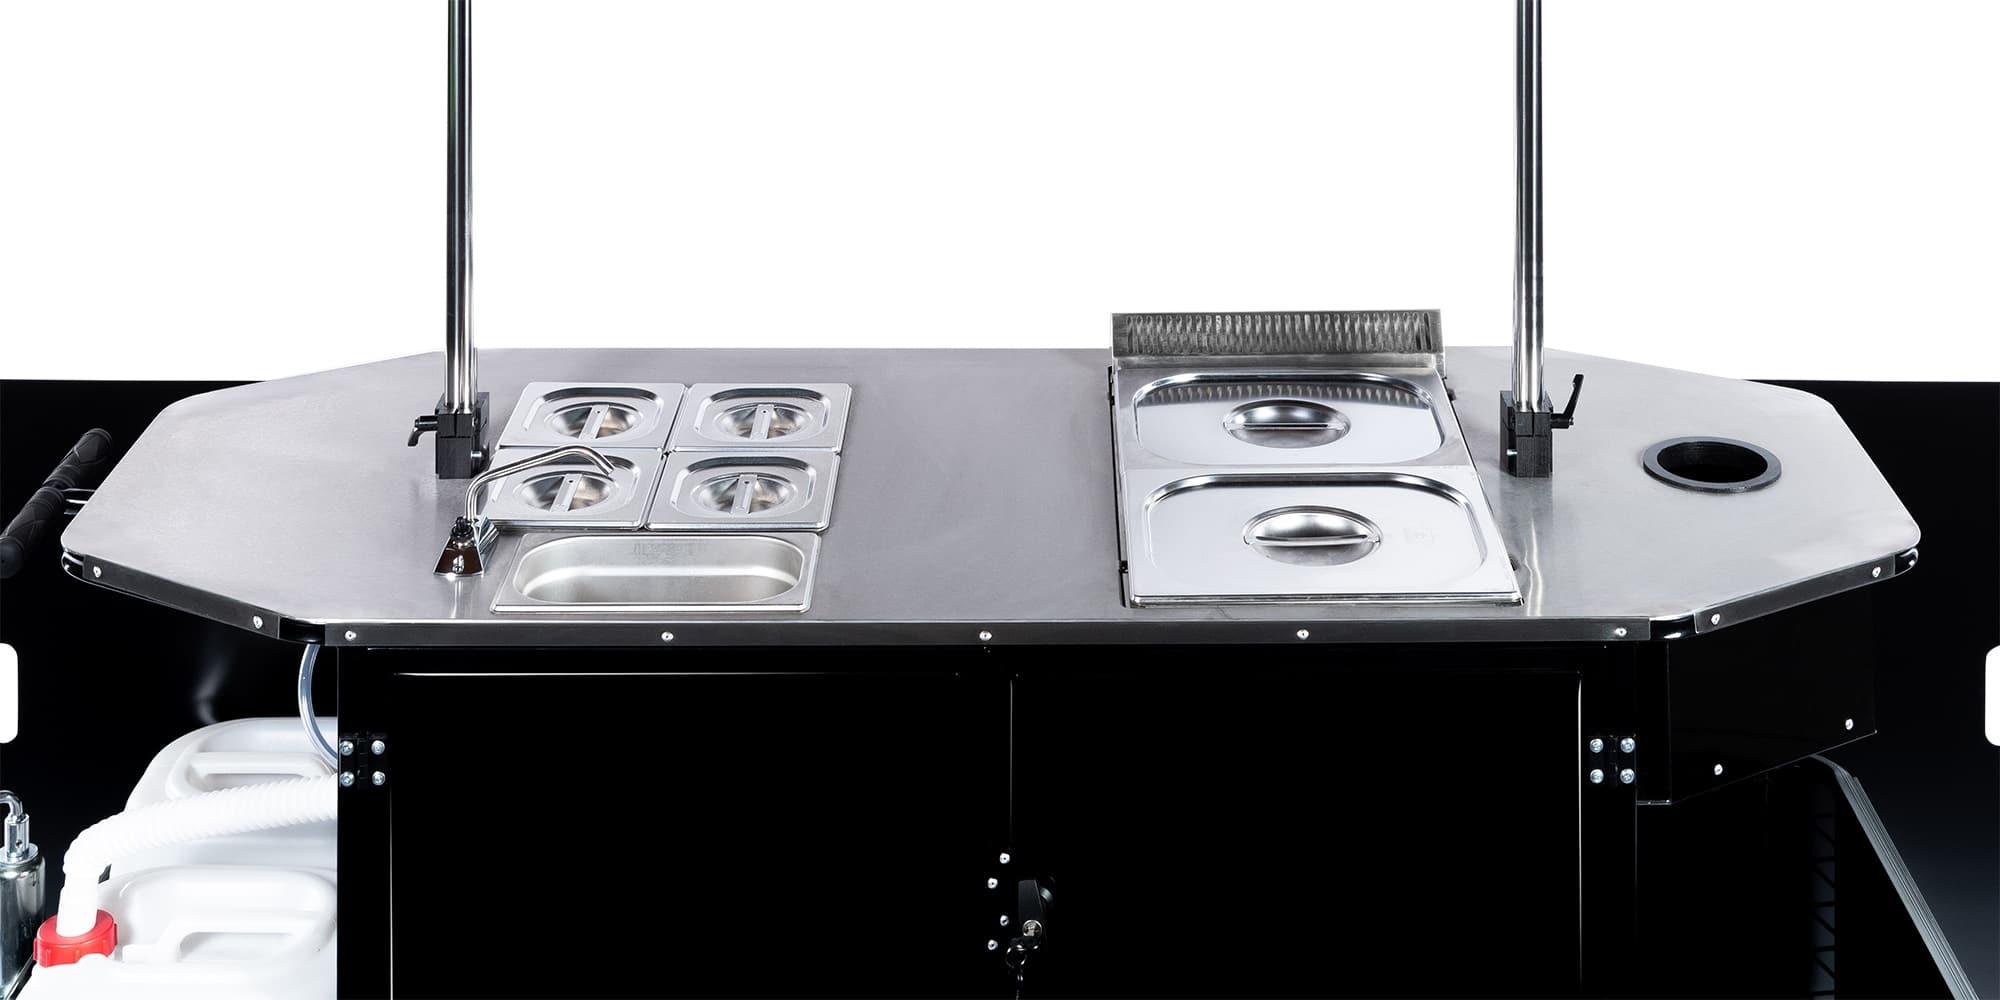 BizzOnWheels hot dog cart countertop equipment and features